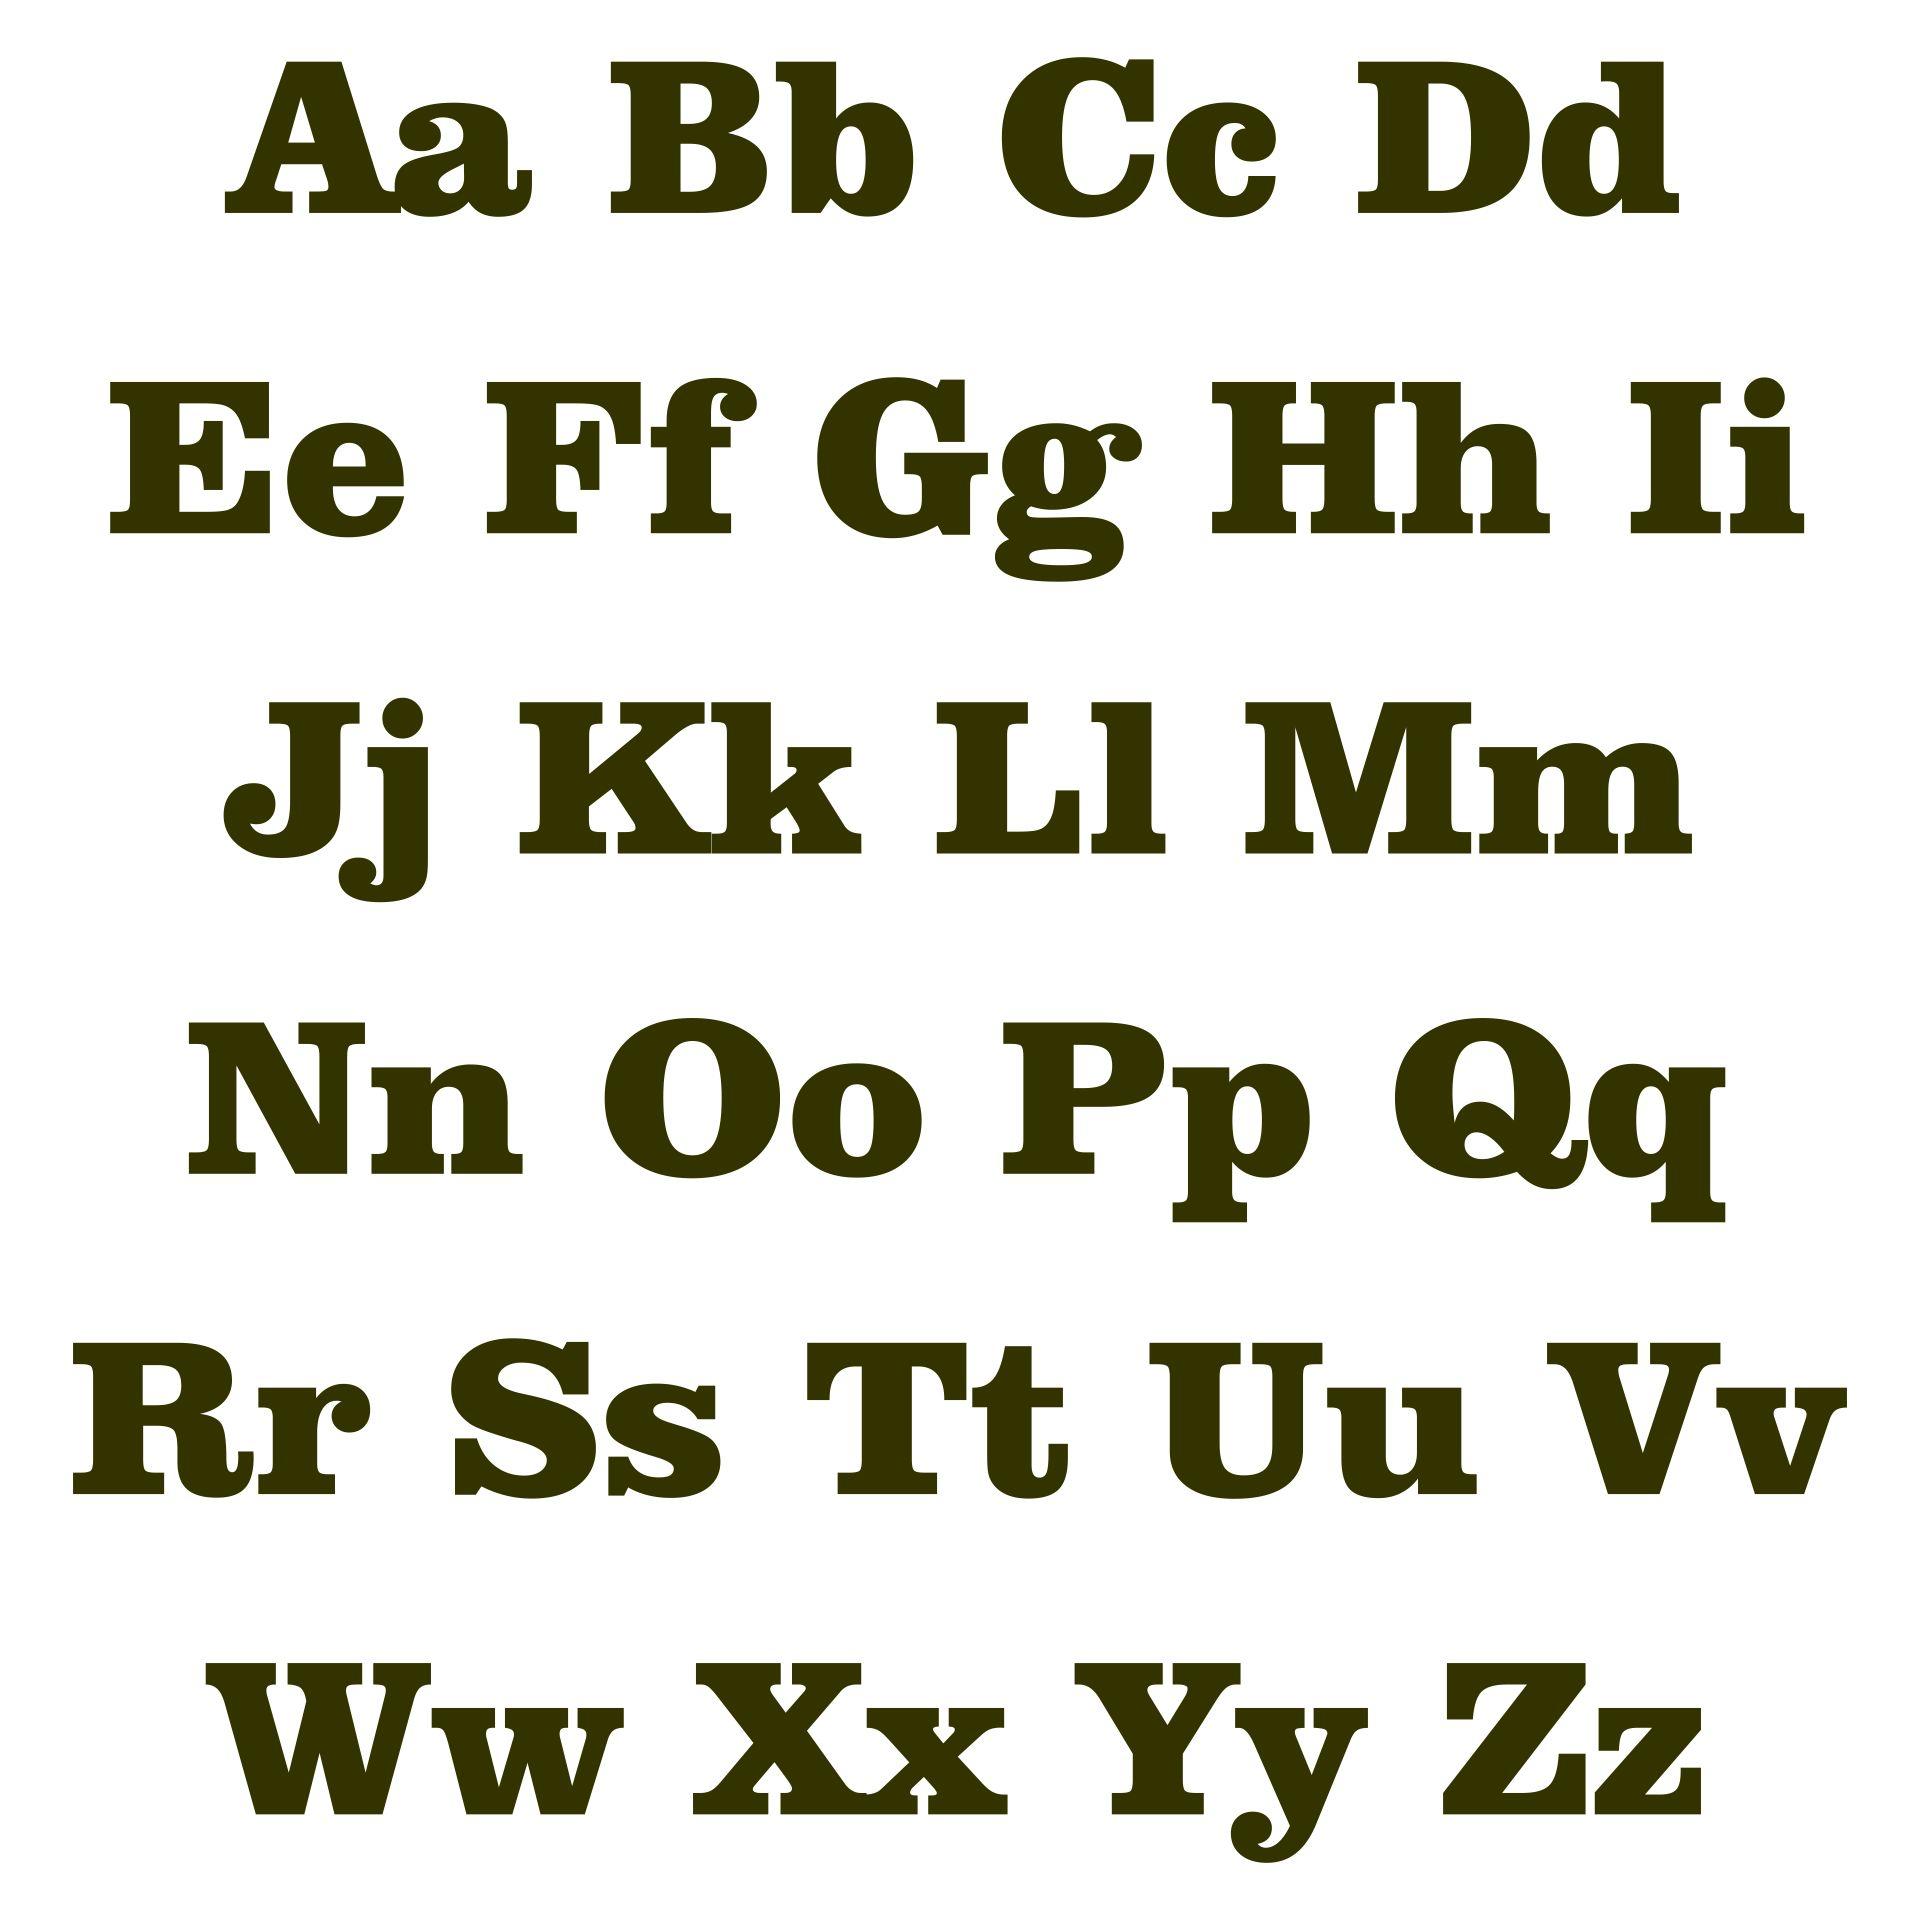 Printable Block Letters For Bulletin Boards